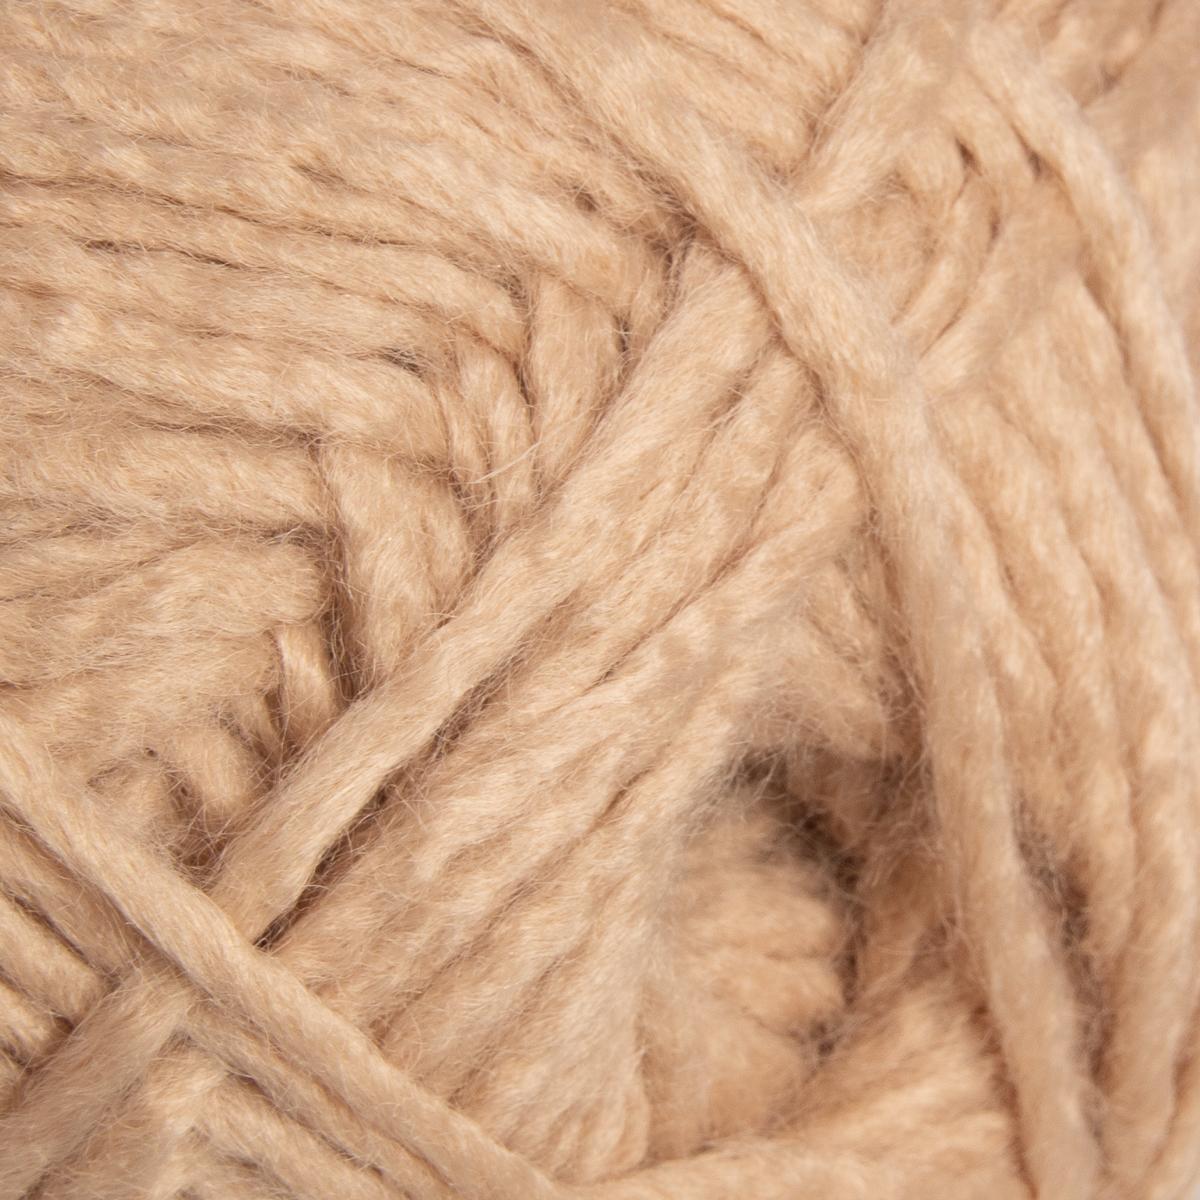 3pk-Lion-Brand-New-Basic-Acrylic-amp-Wool-Yarn-Medium-4-Knit-Crochet-Skeins-Soft thumbnail 23